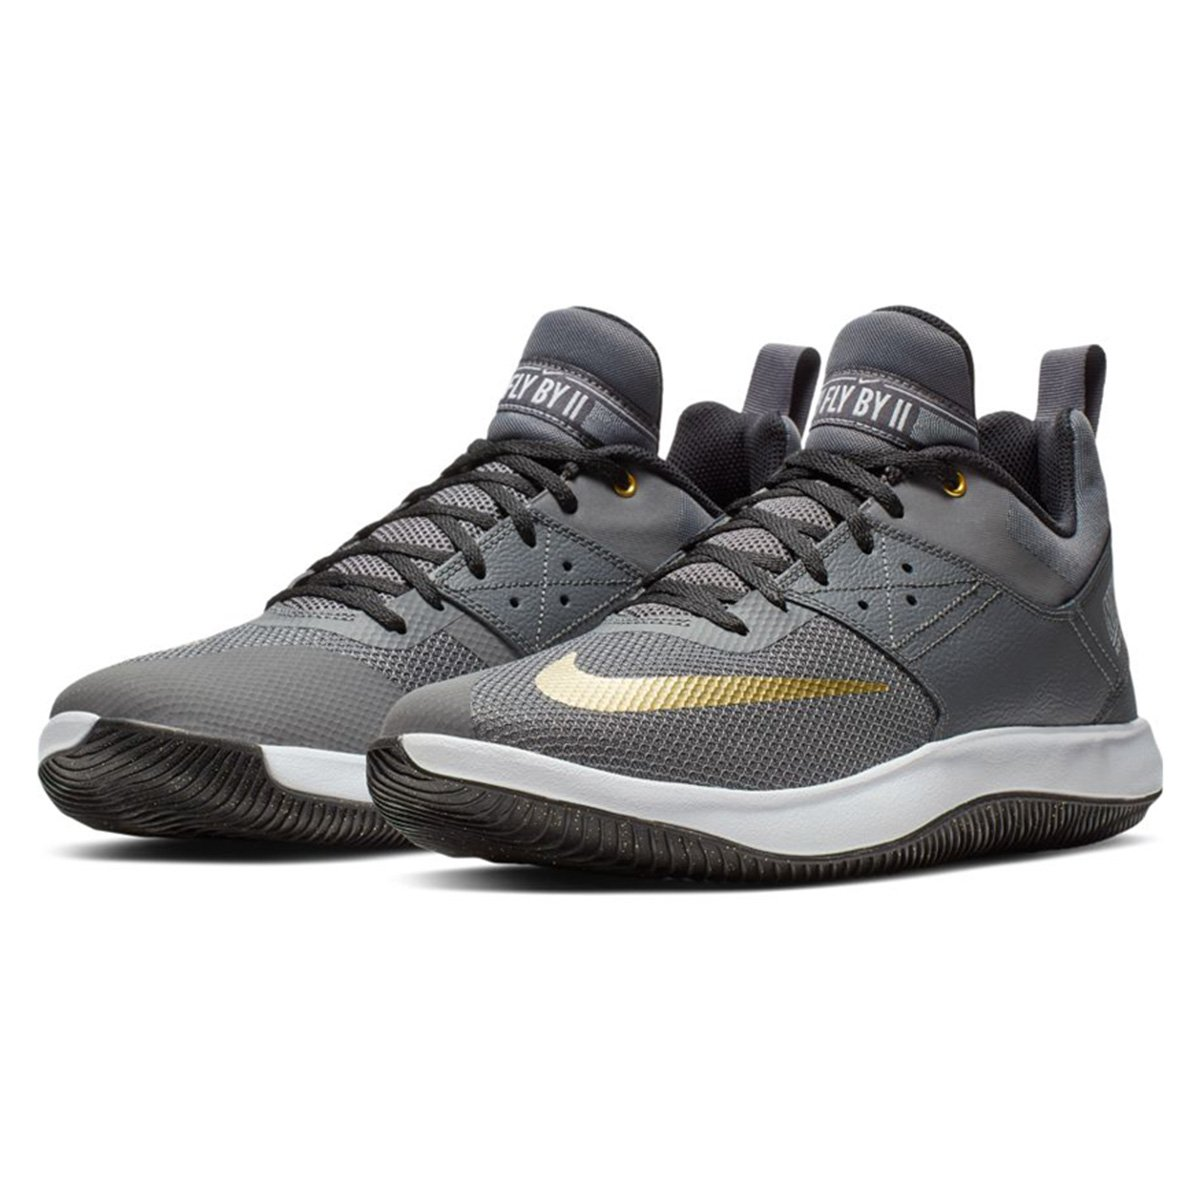 7ff4823fc Tênis Nike Fly By Low II Masculino - Chumbo e Dourado | Loja NBA